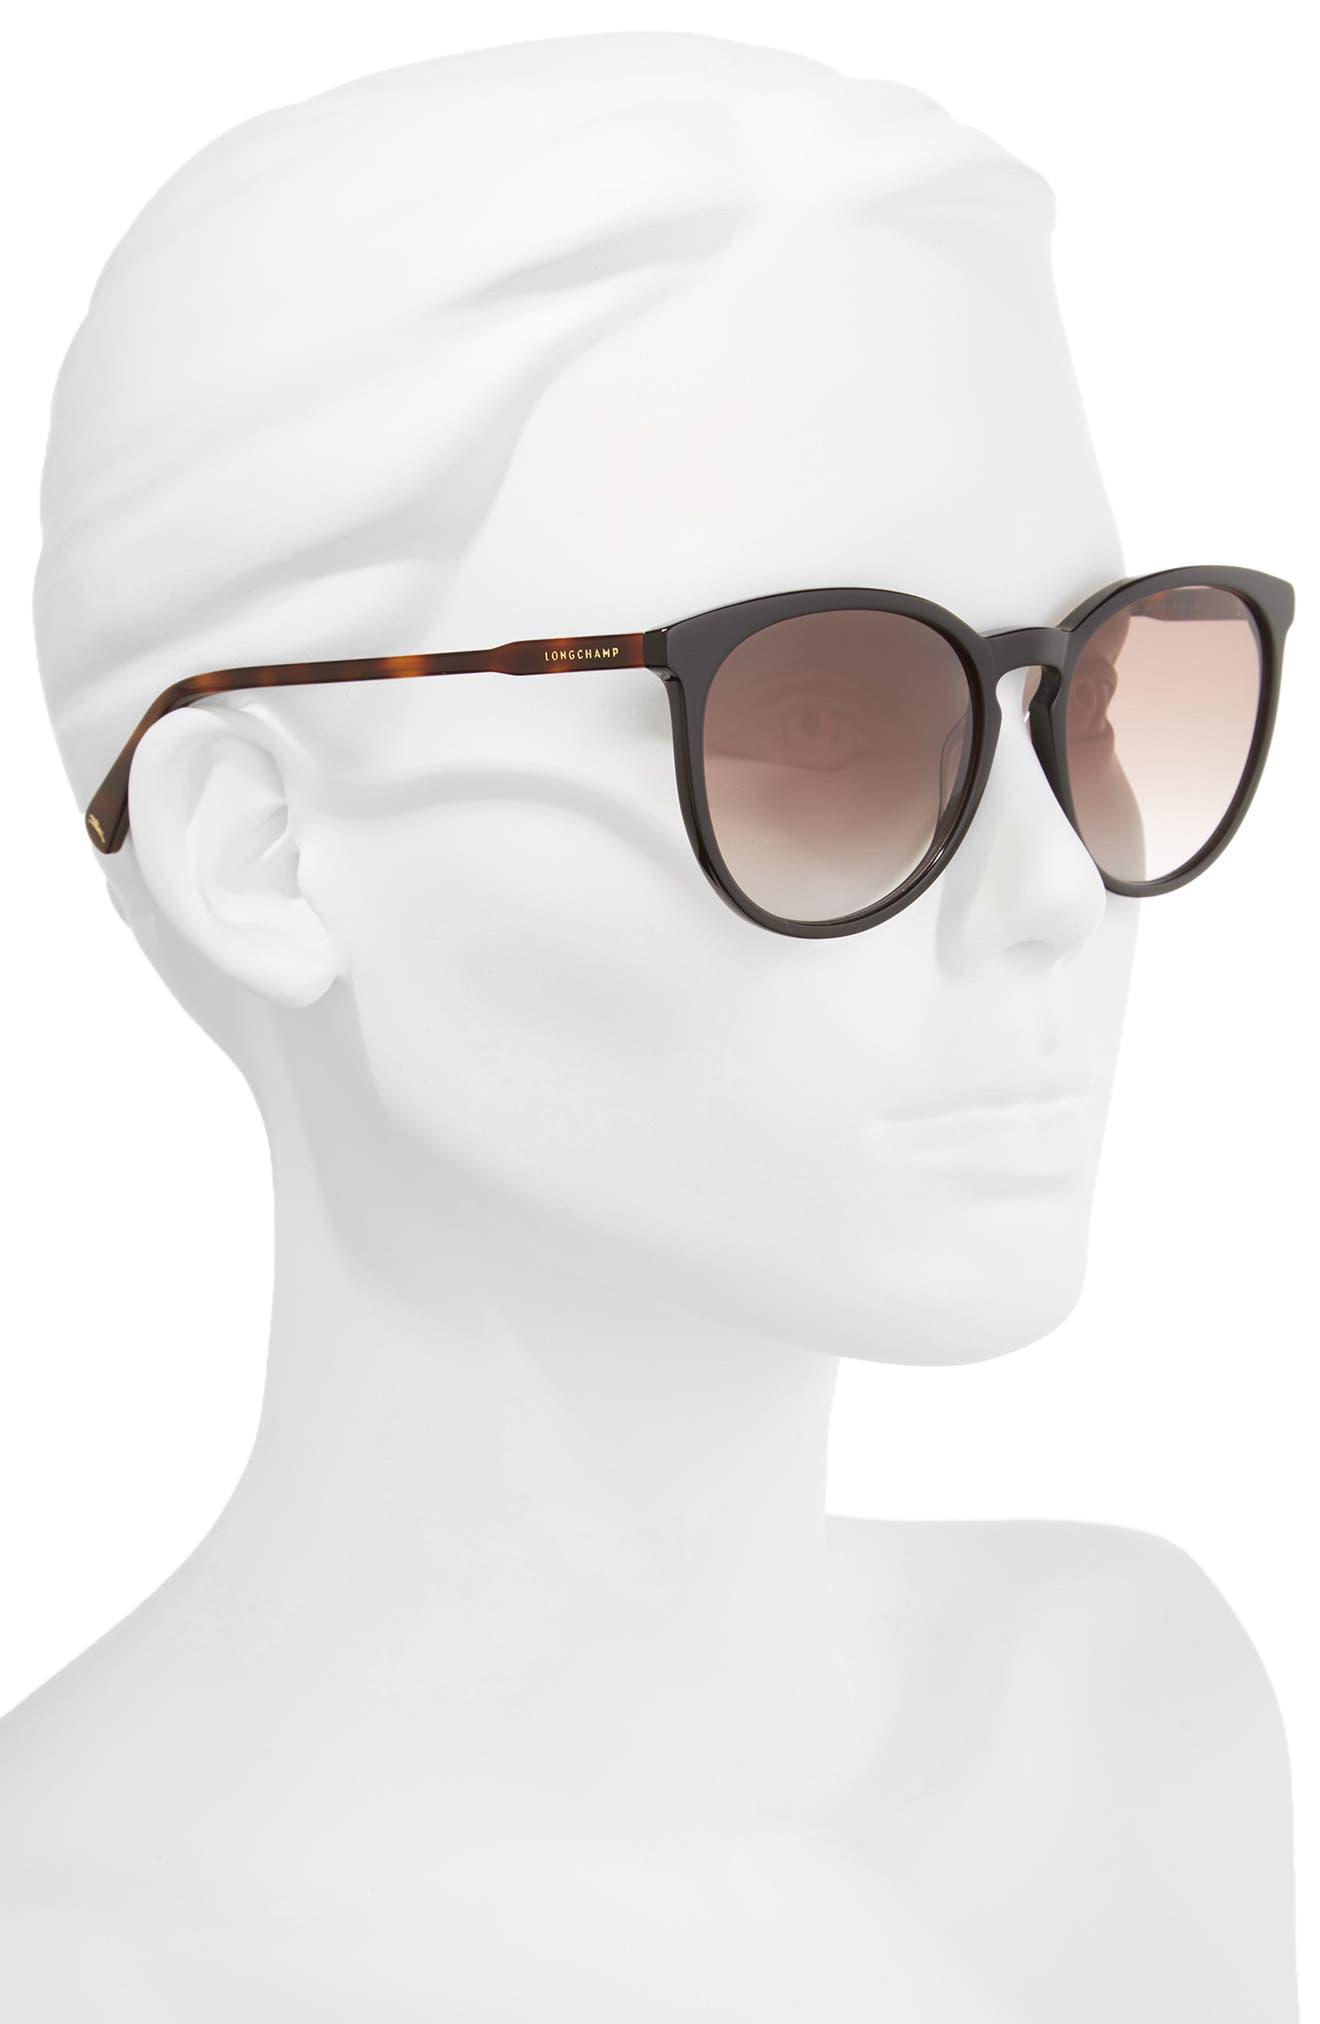 56mm Round Sunglasses,                             Alternate thumbnail 2, color,                             BLACK/ HAVANA